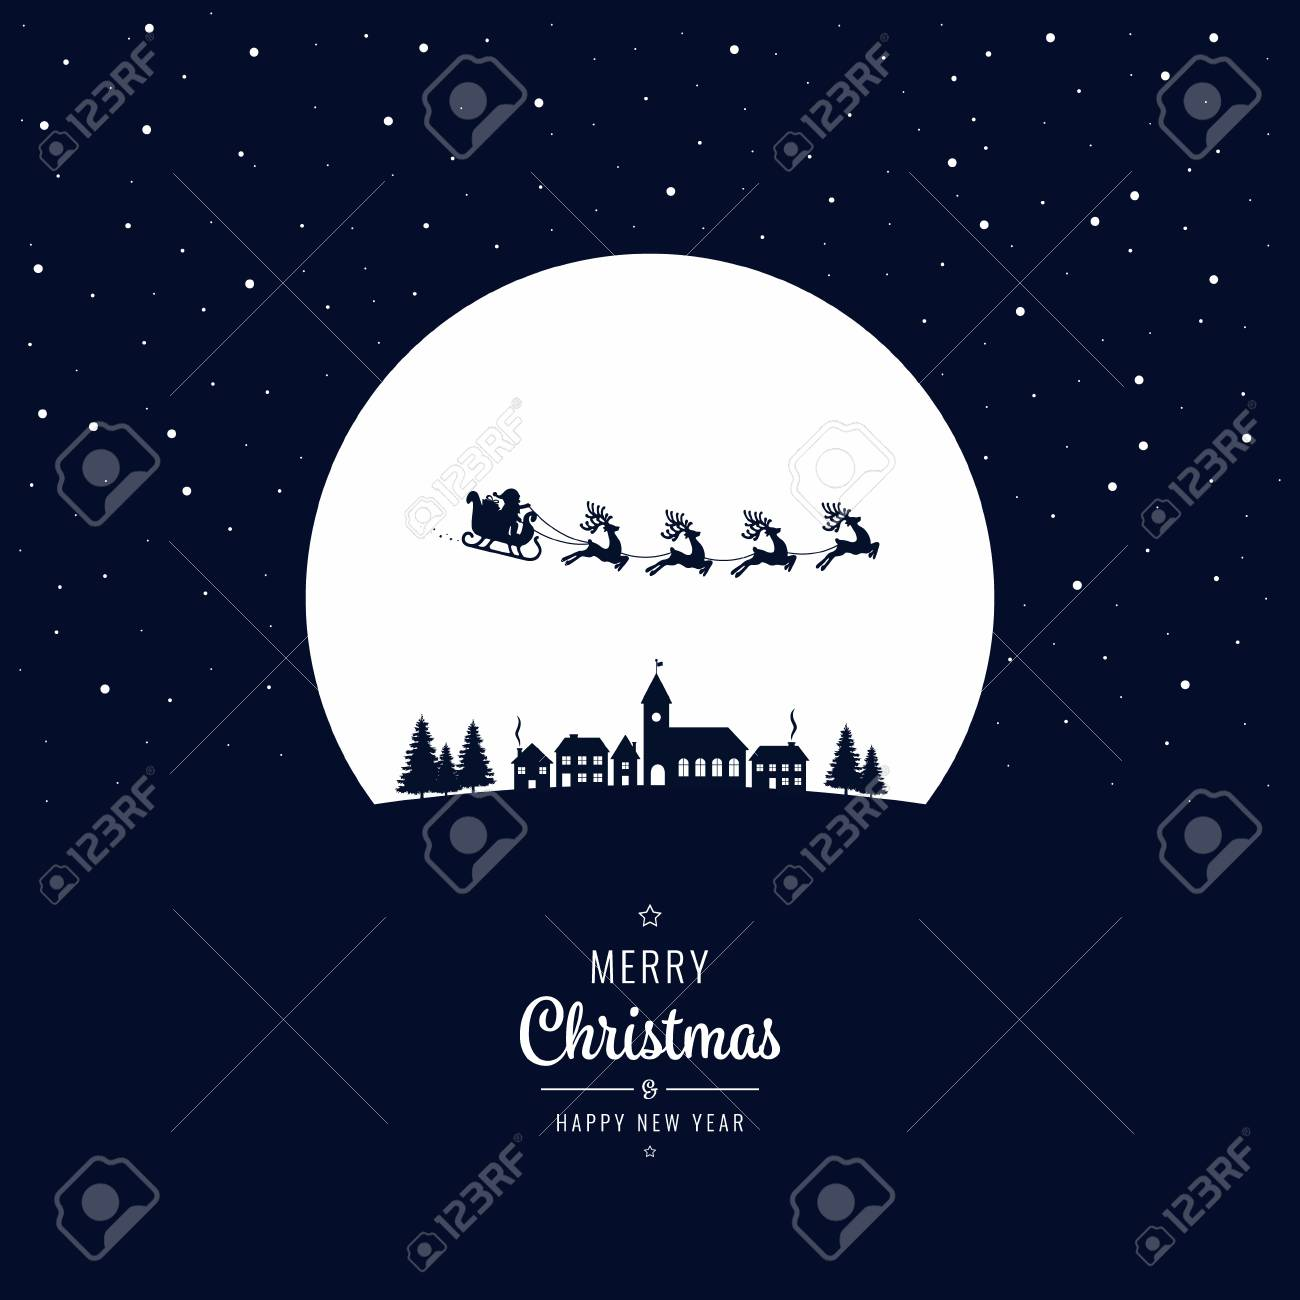 Santa sleigh flying into the winter village christmas night - 87334546